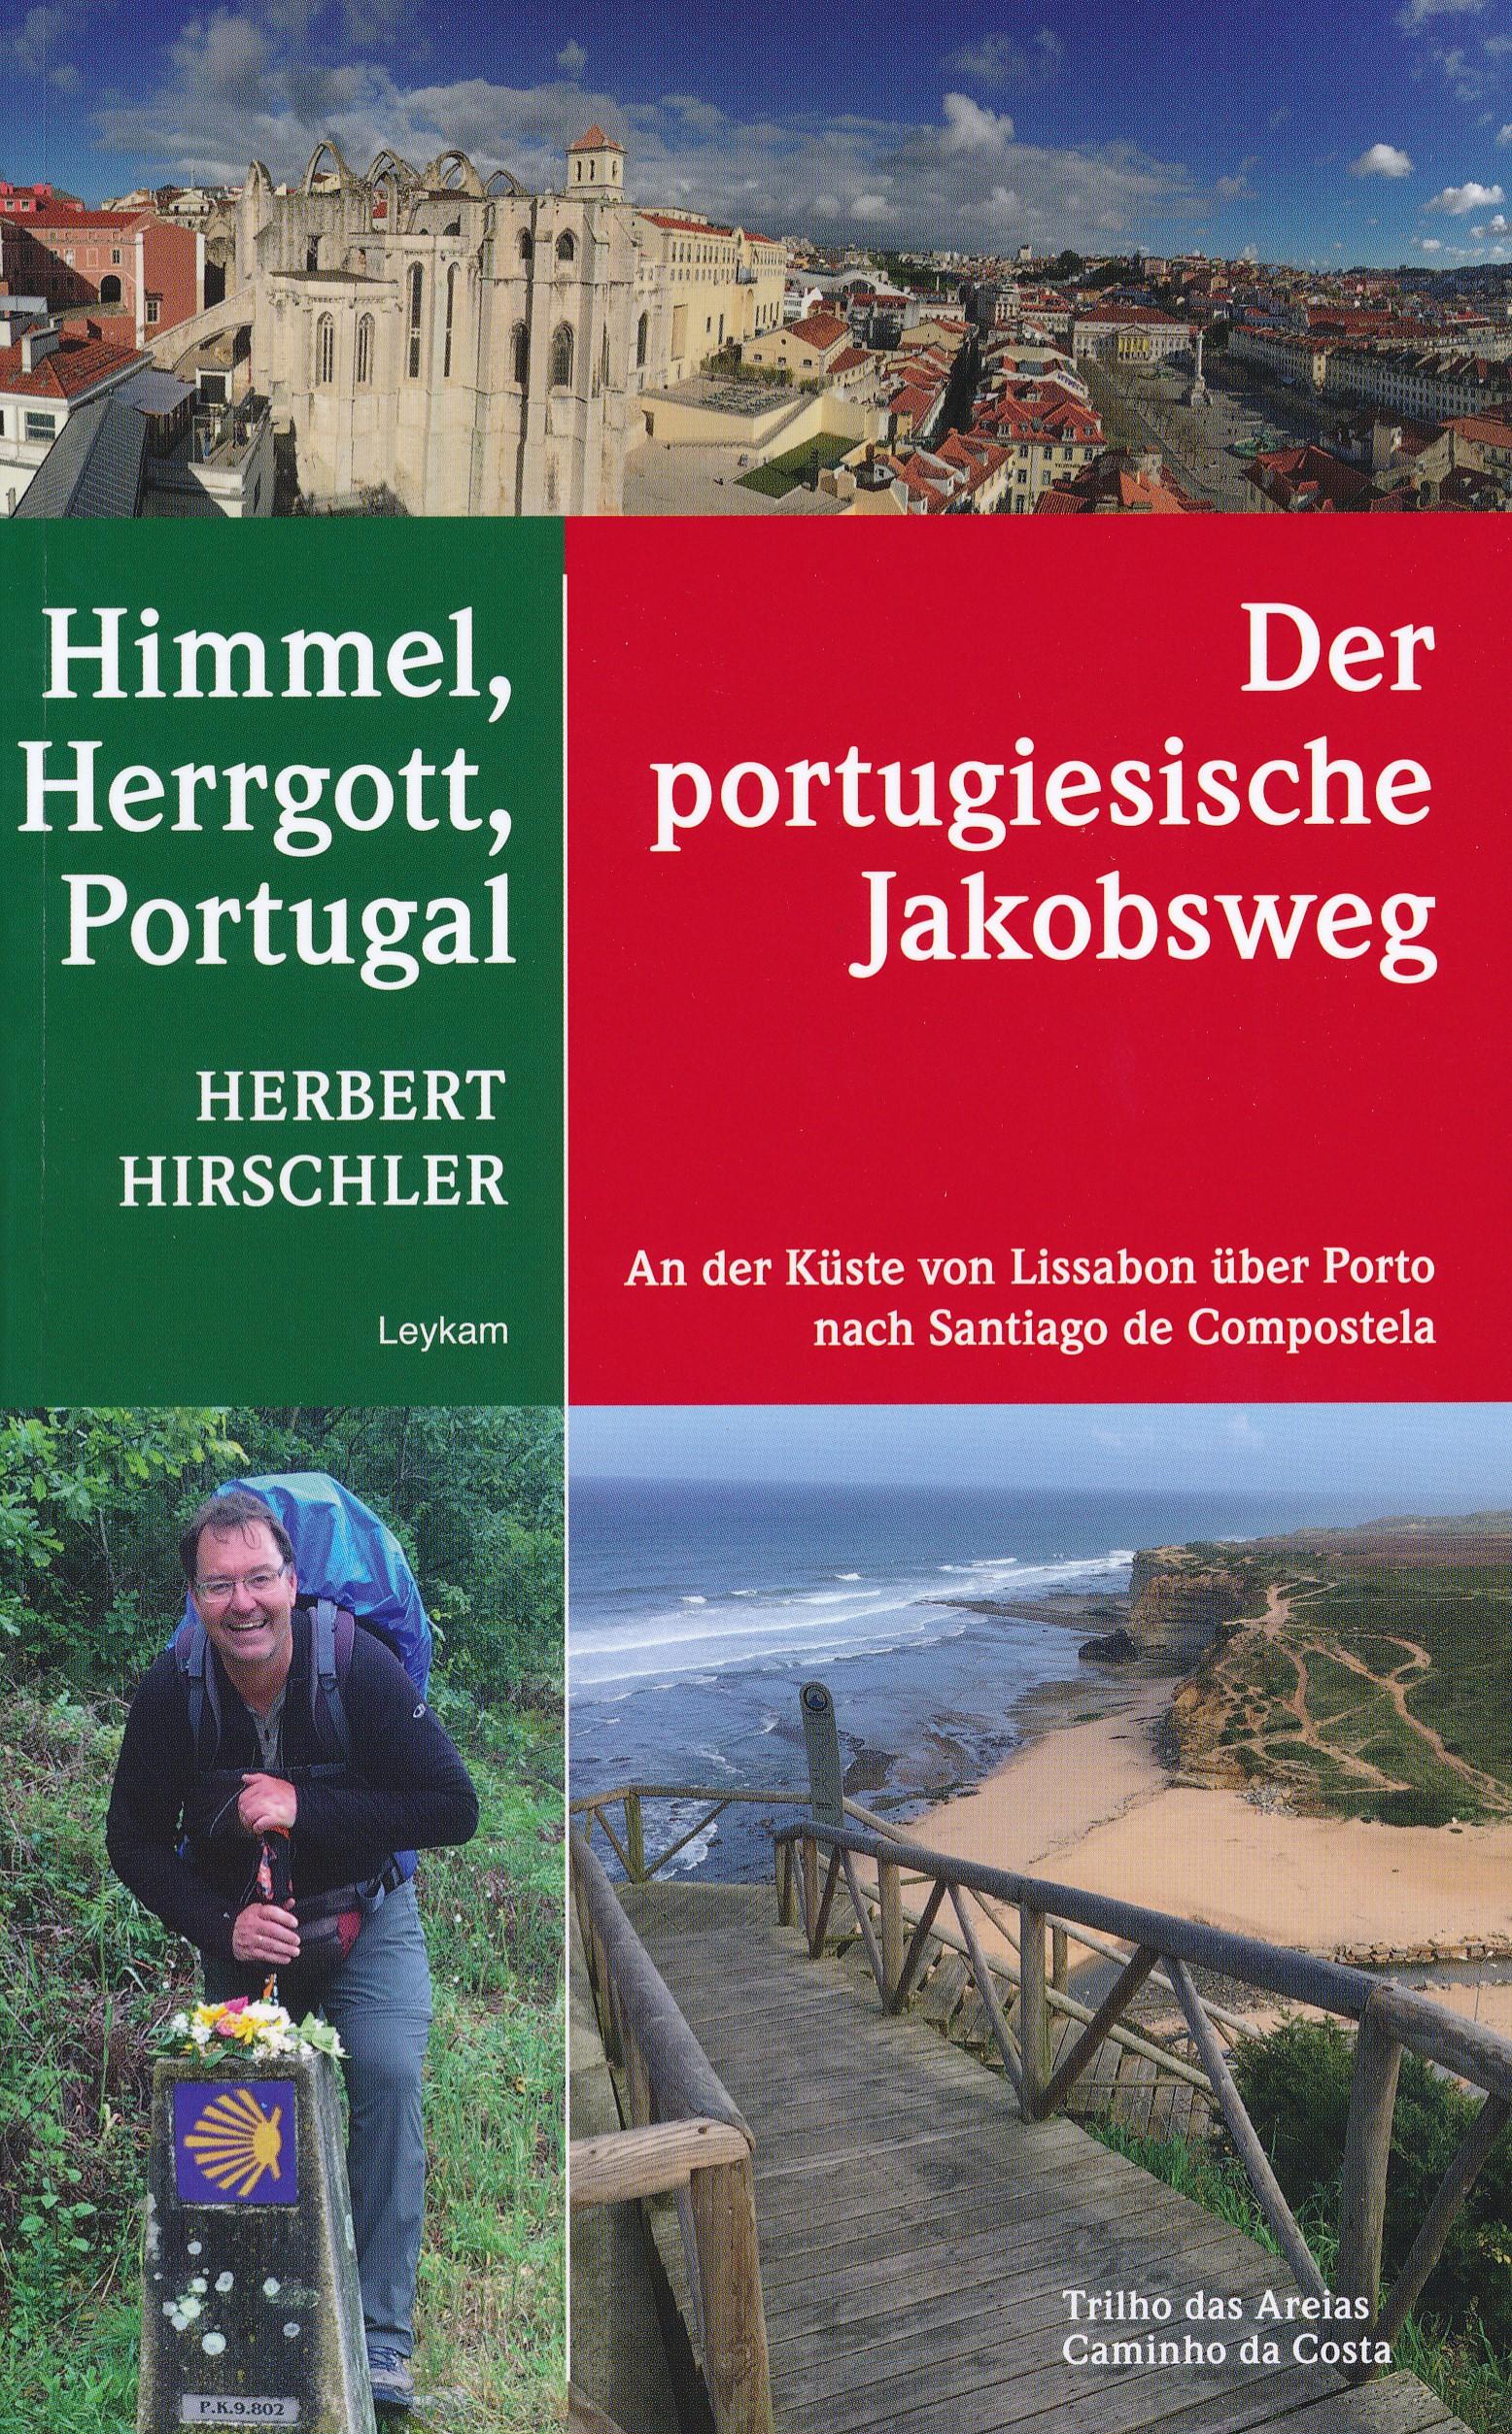 Reisverhaal Himmel, Hergott, Portugal - Der portugische Jakobsweg | Herbert Hirs <br/>€ 20.95 <br/> <a href='https://www.dezwerver.nl/reisgidsen/?tt=1554_252853_241358_&r=https%3A%2F%2Fwww.dezwerver.nl%2Fr%2Feuropa%2Fportugal%2Foverig-noord-1%2Fc%2Fboeken%2Freisverhalen%2F9783701180455%2Freisverhaal-himmel-hergott-portugal-der-portugische-jakobsweg-herbert-hirschler%2F' target='_blank'>Meer Info</a>